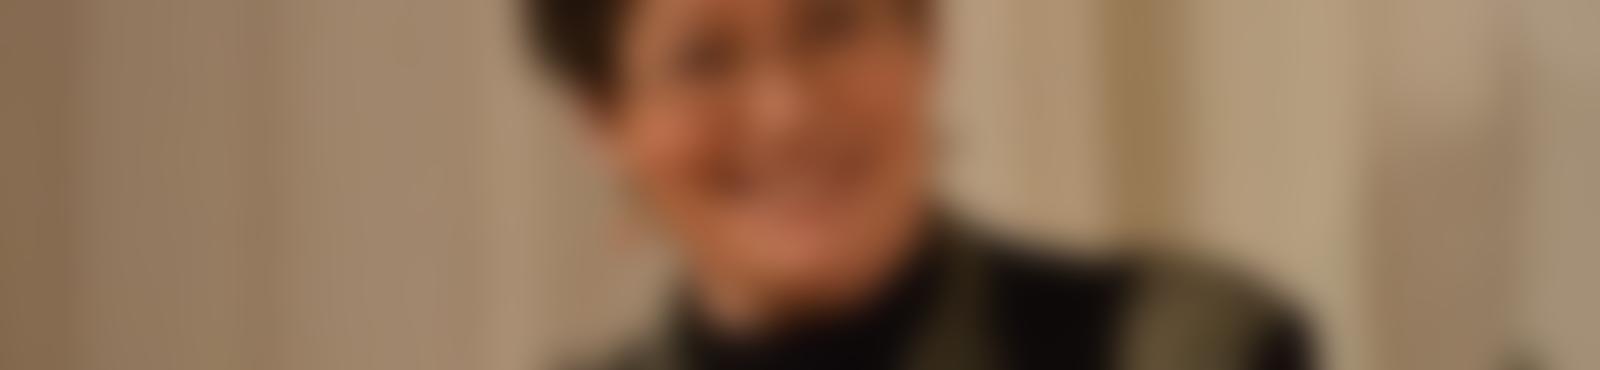 Blurred 77157aa4 f550 48fa 97b8 807f781e467a